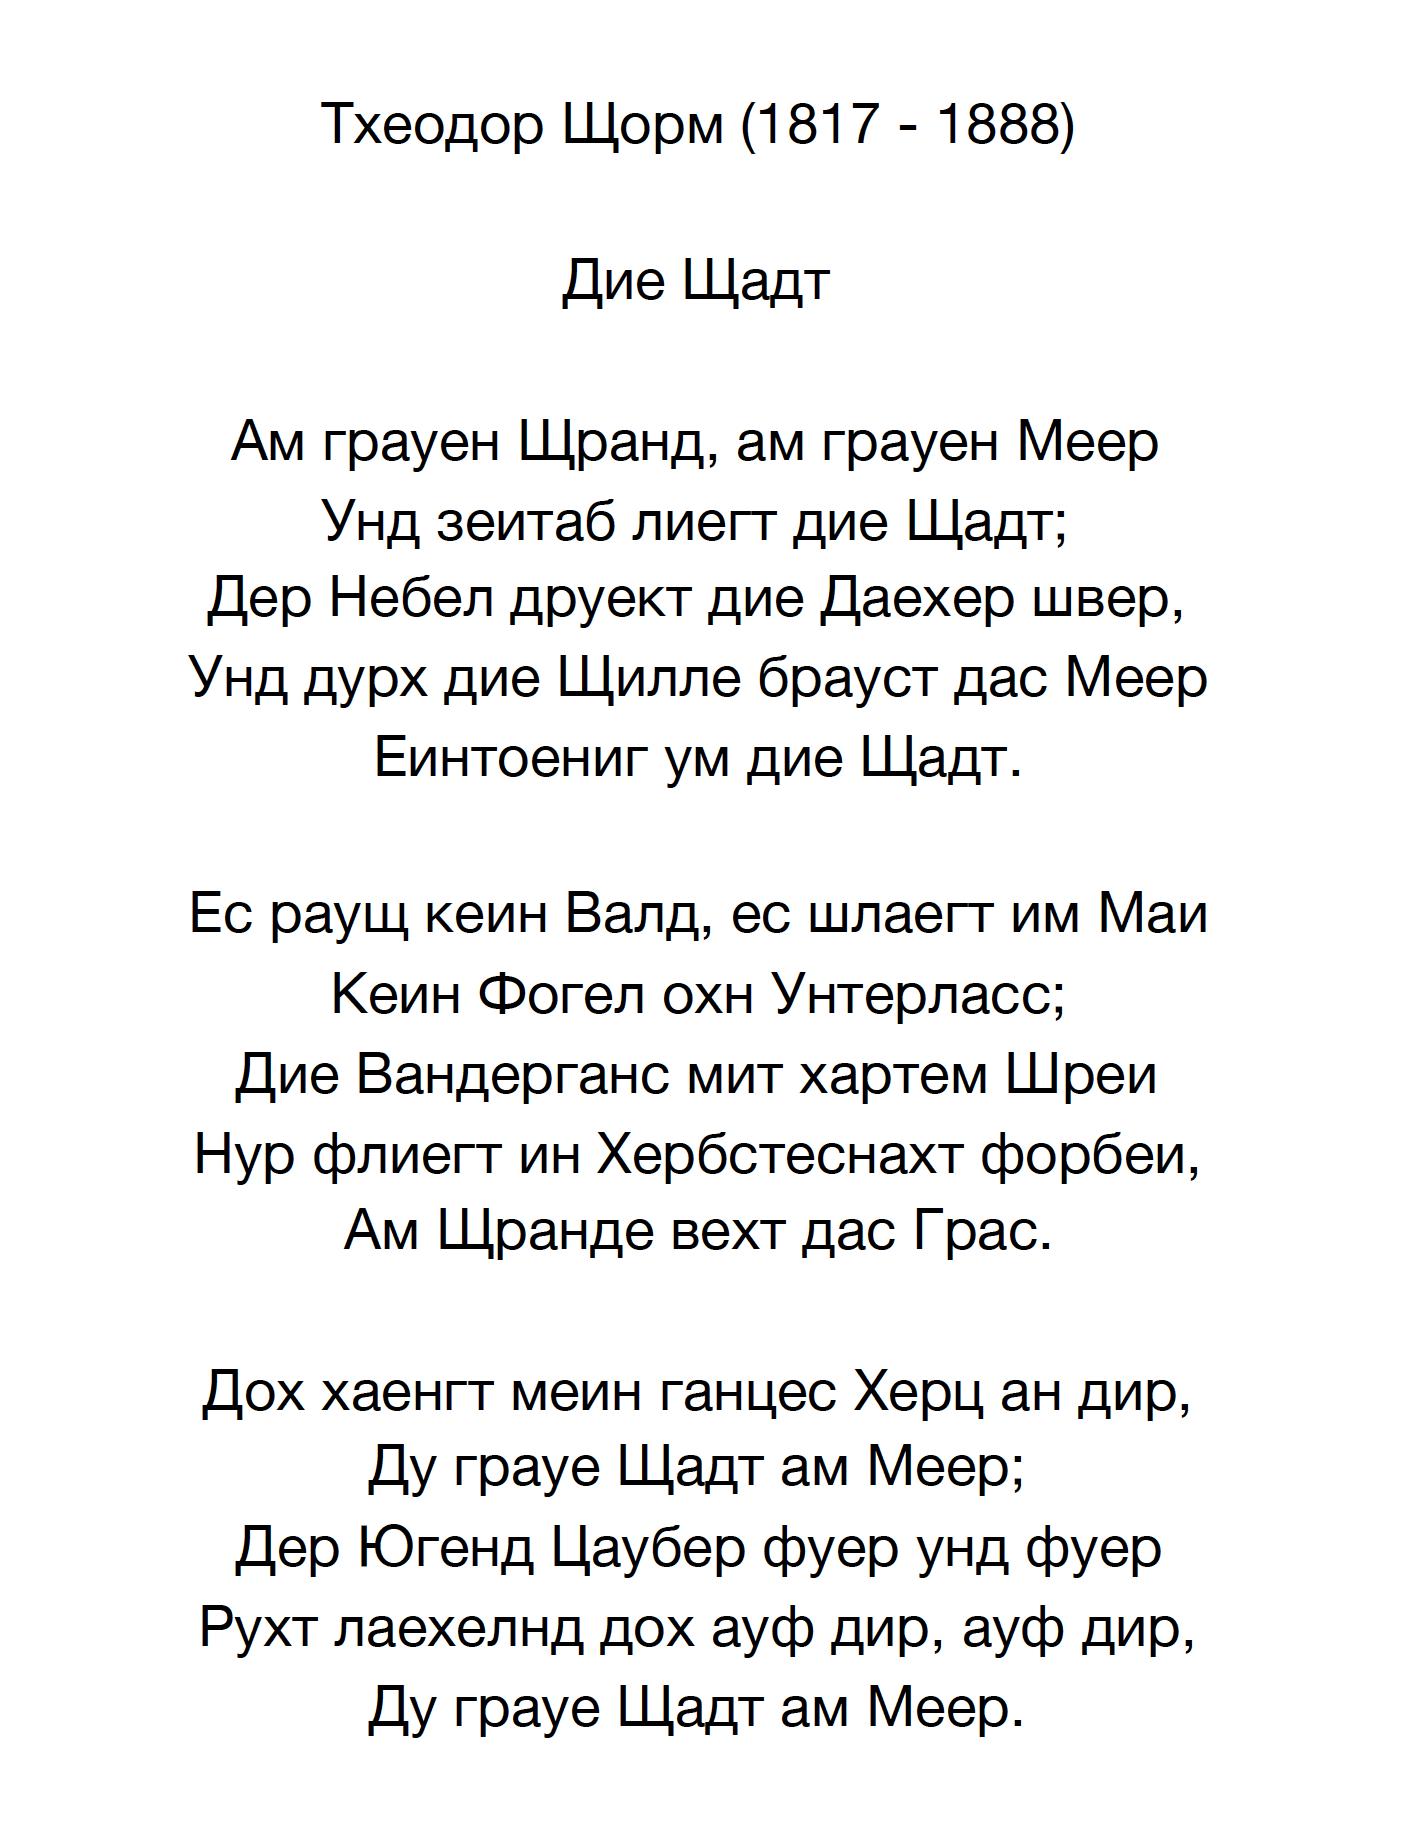 bulgarische schrift